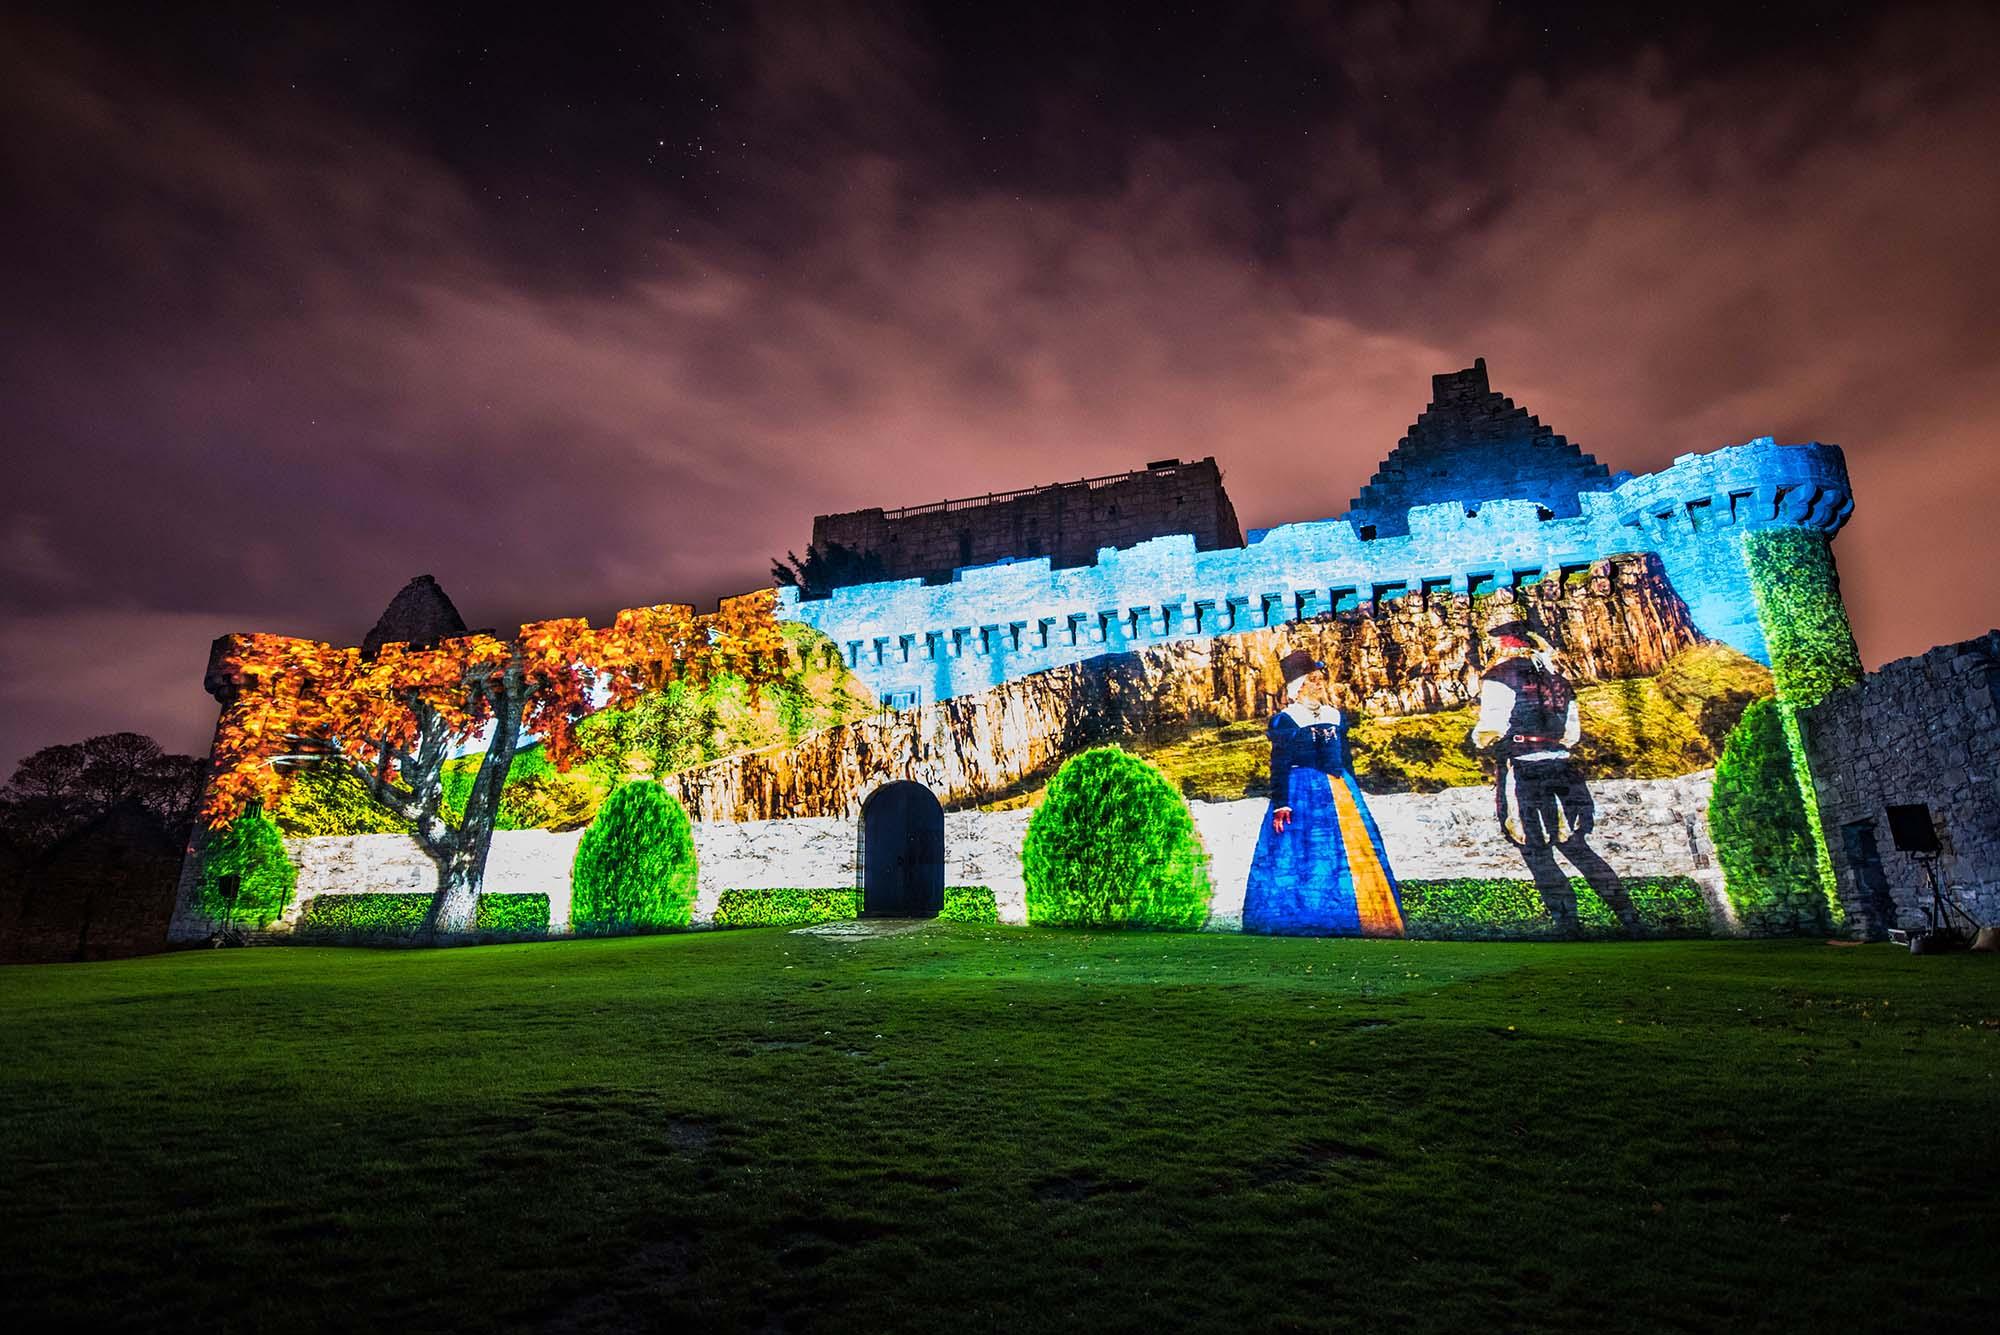 Spotlight on Mary, Projection Light Walk, on Craigmillar Main Wall